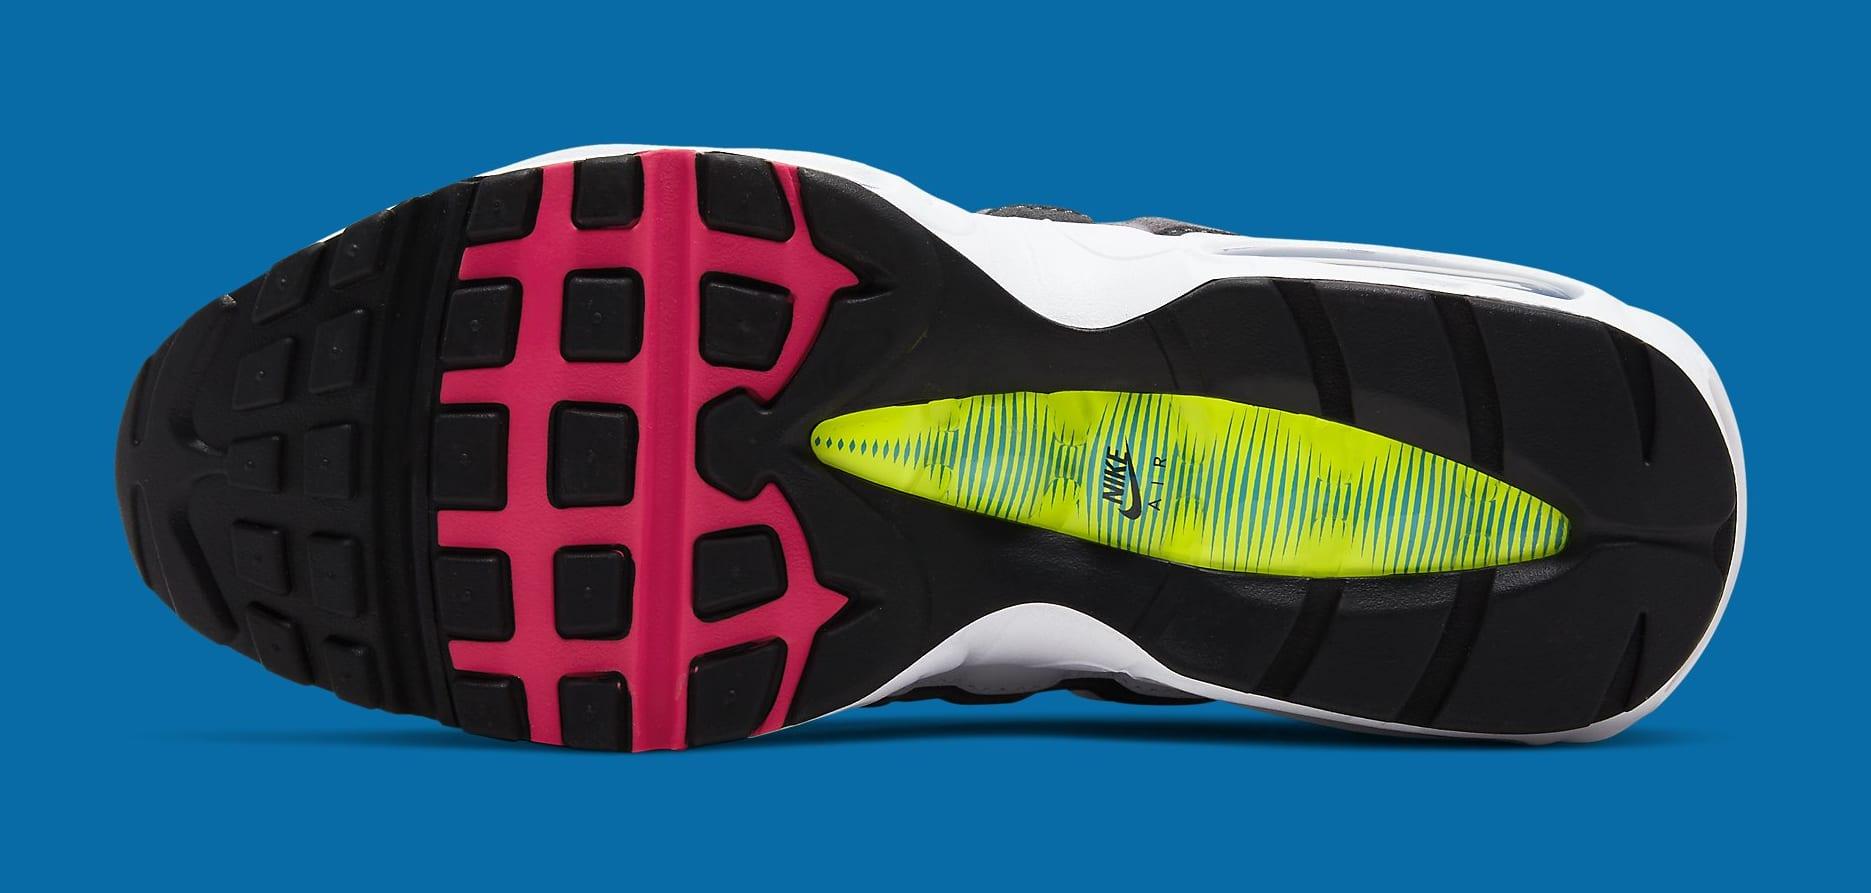 Nike Air Max 95 'Greedy 2.0' CJ0589-001 Outsole